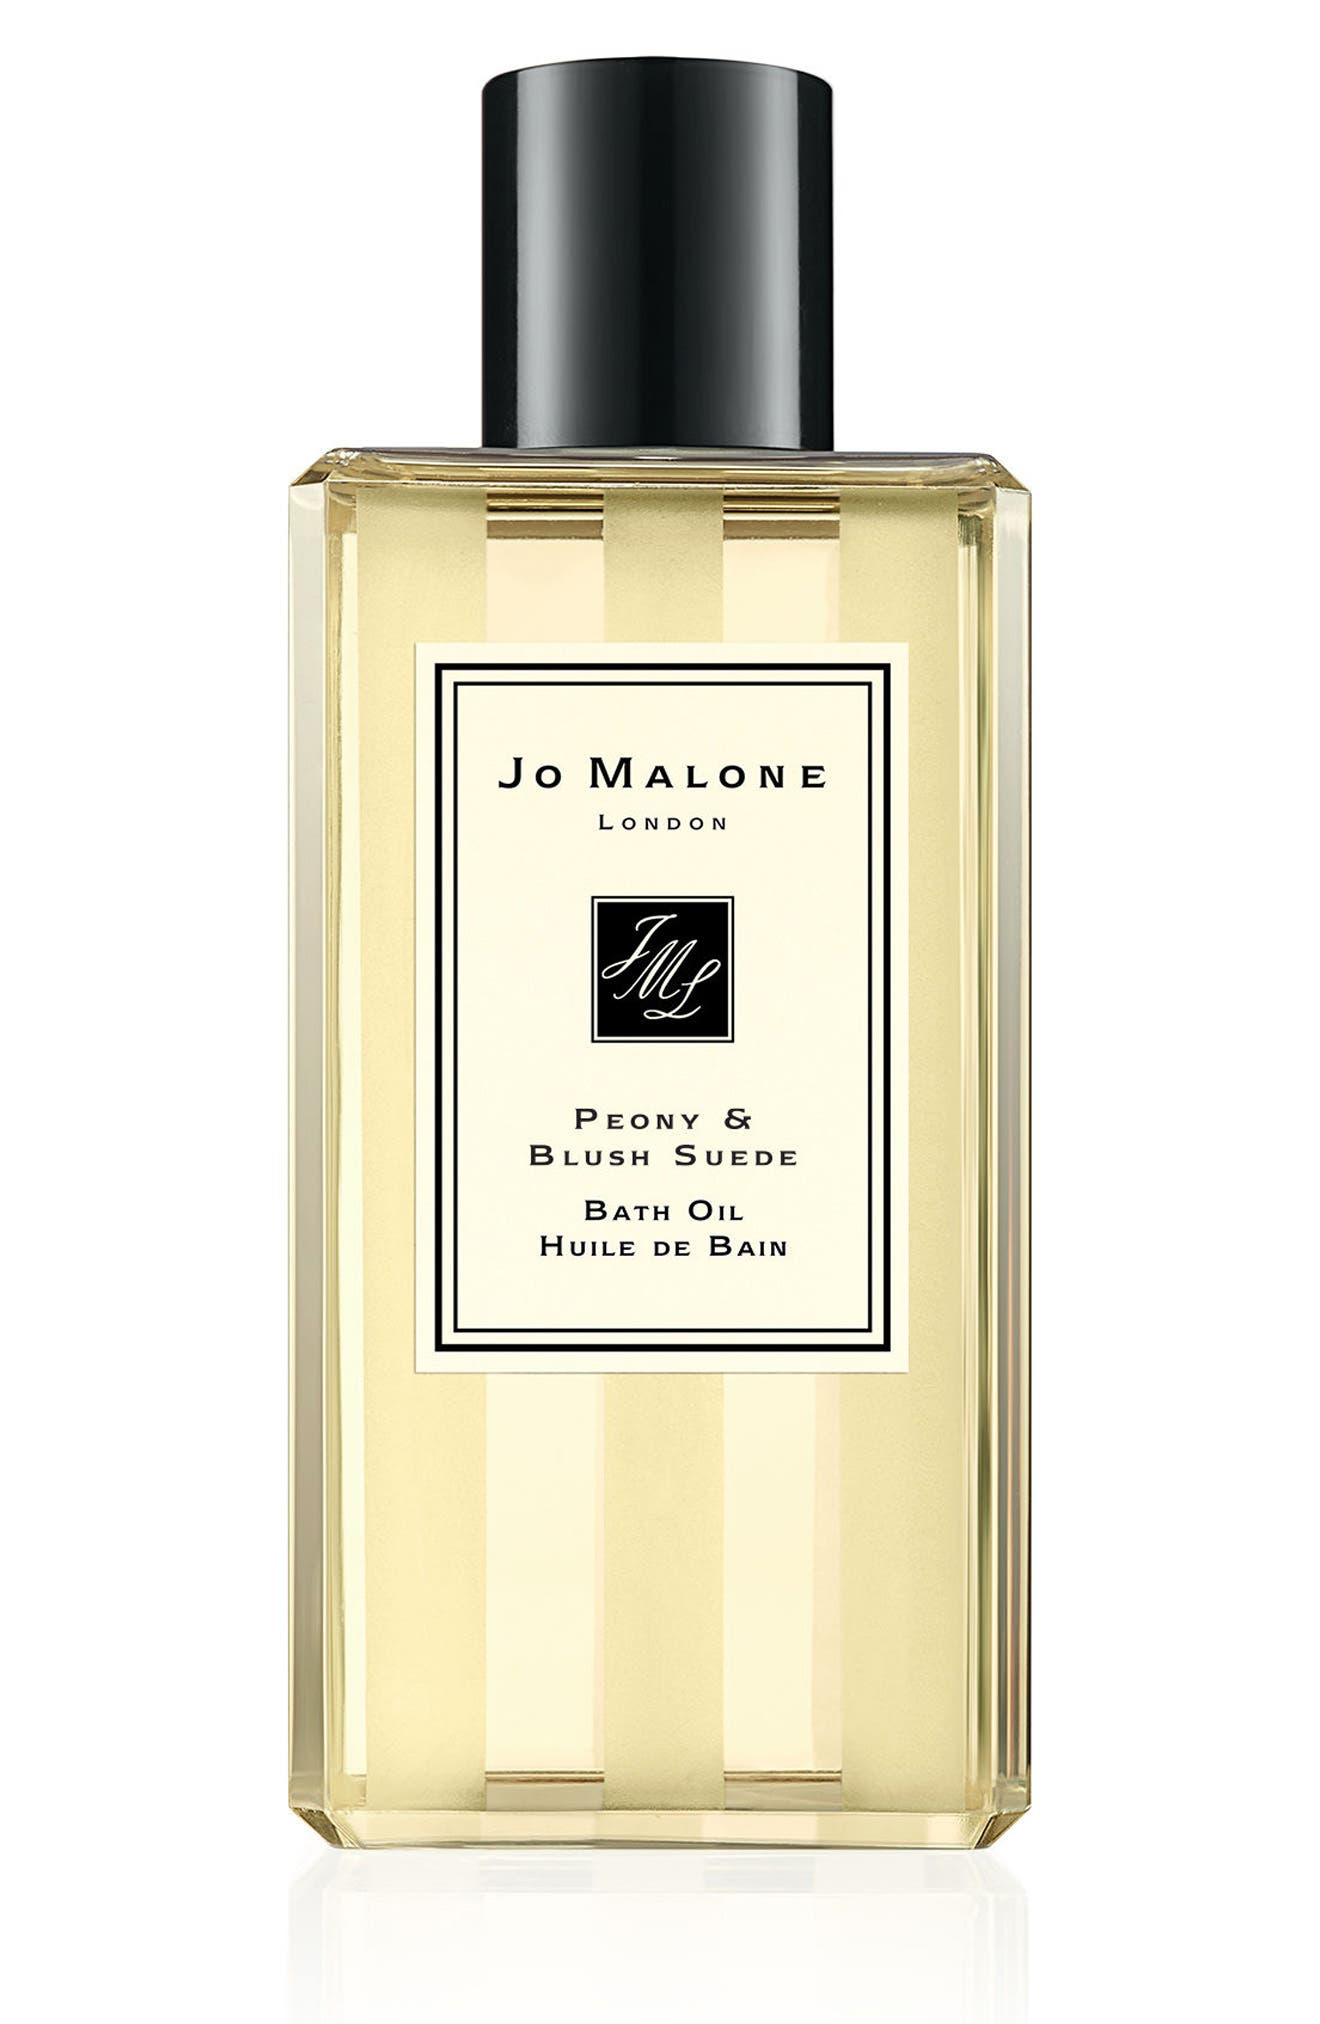 Jo Malone London™ Peony & Blush Suede Bath Oil